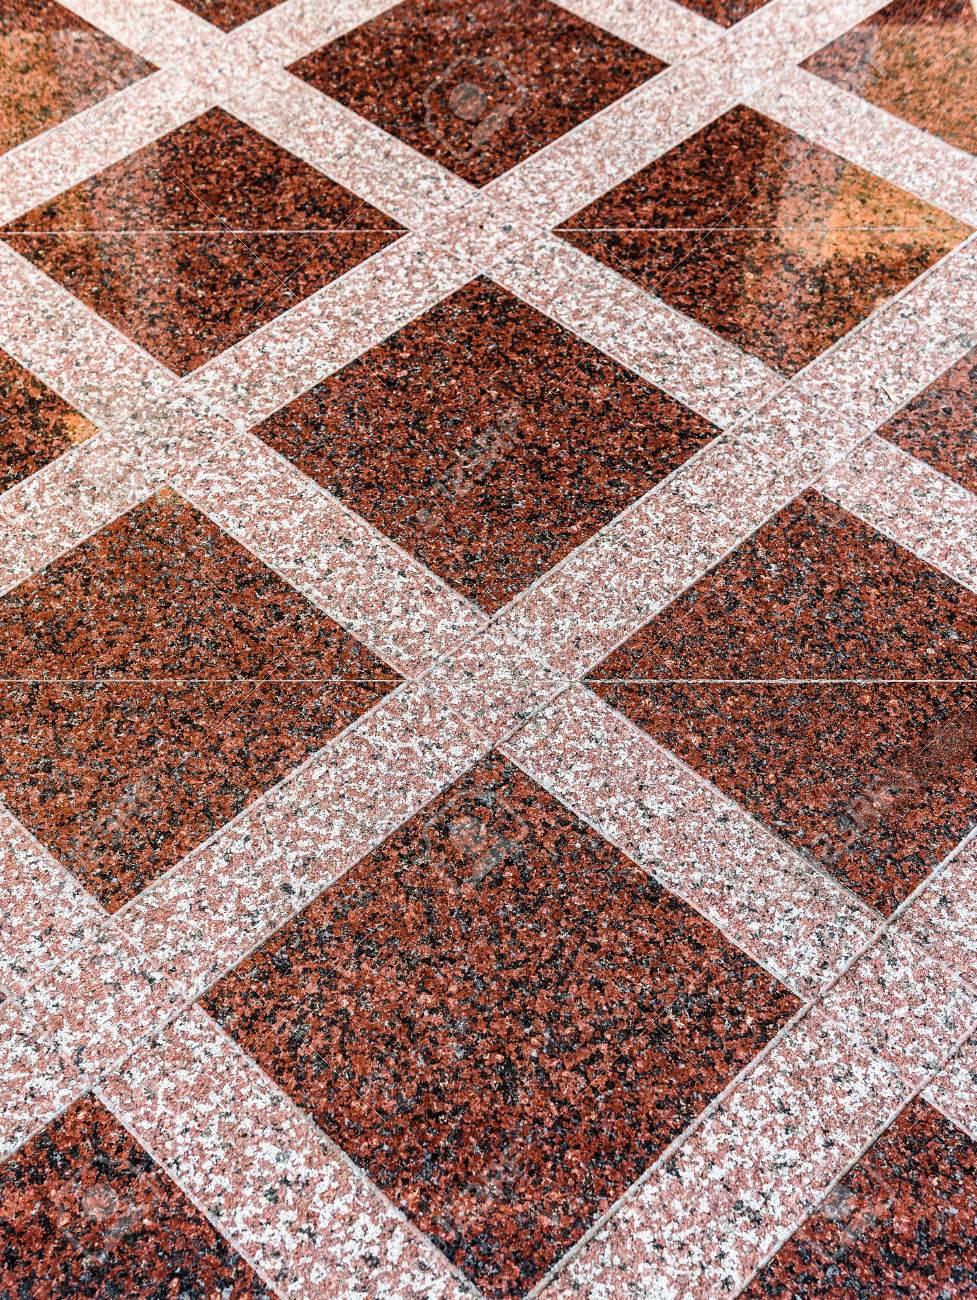 mrmol o granito del piso losas para pavimentos pavimento exterior natural gris textura de piedra